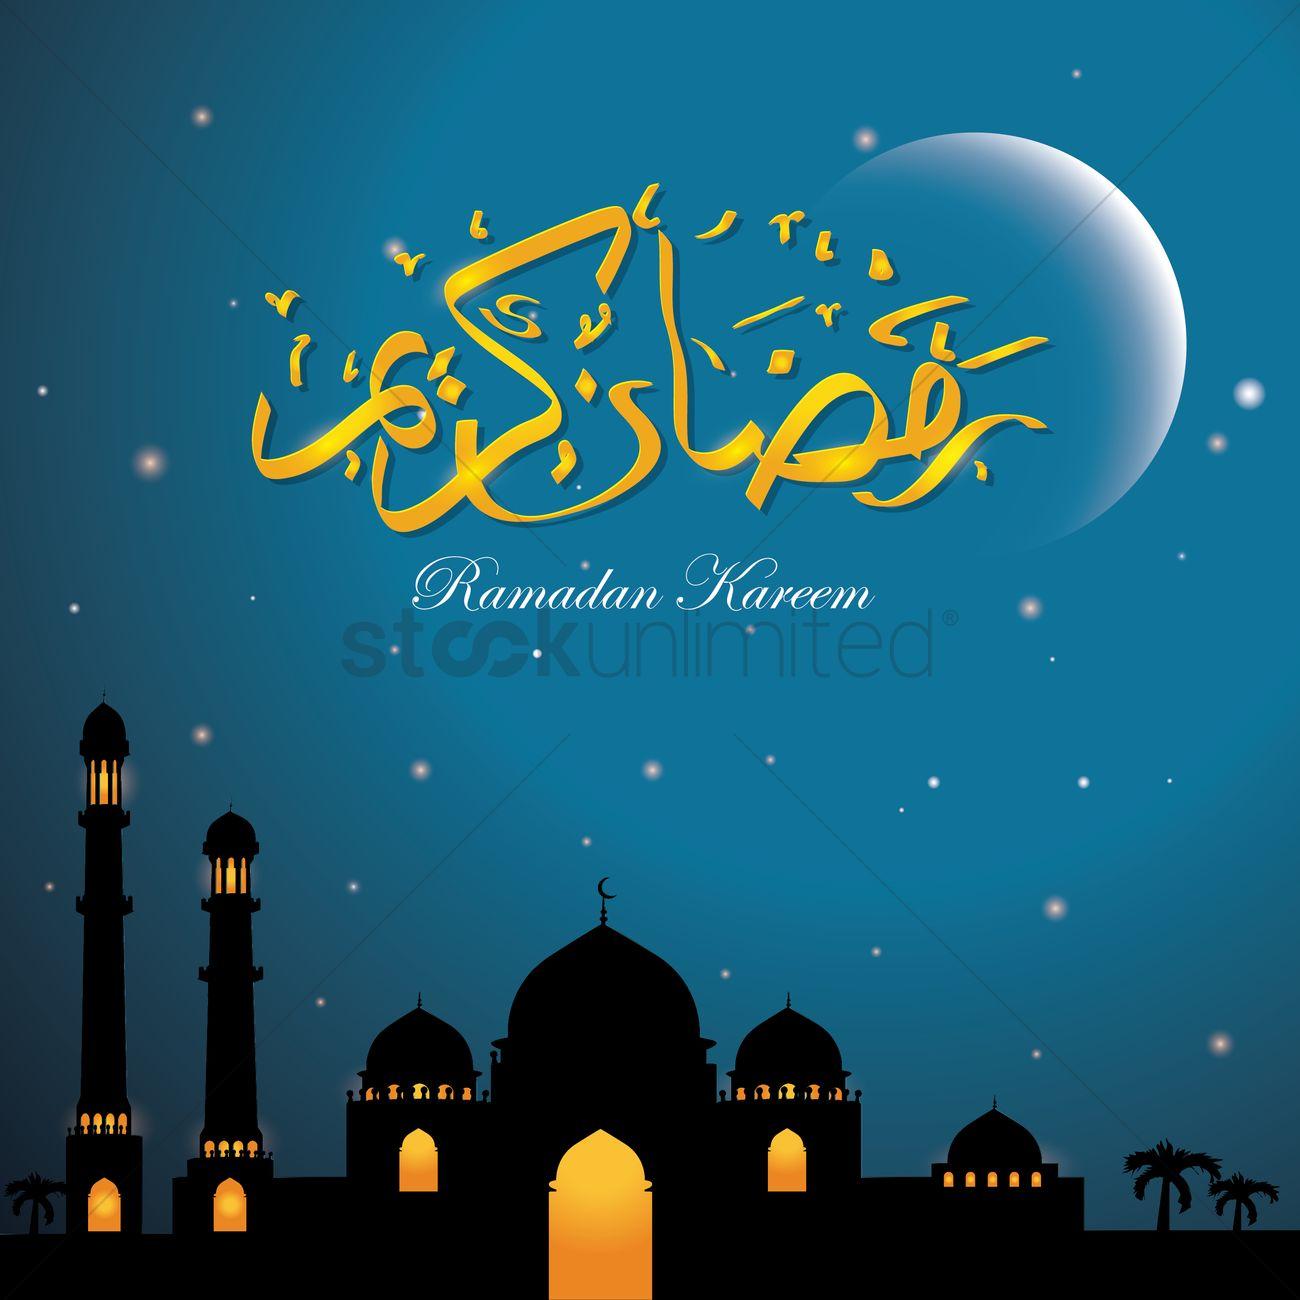 Ramadan Kareem Greeting In Jawi Vector Image 1827021 Stockunlimited